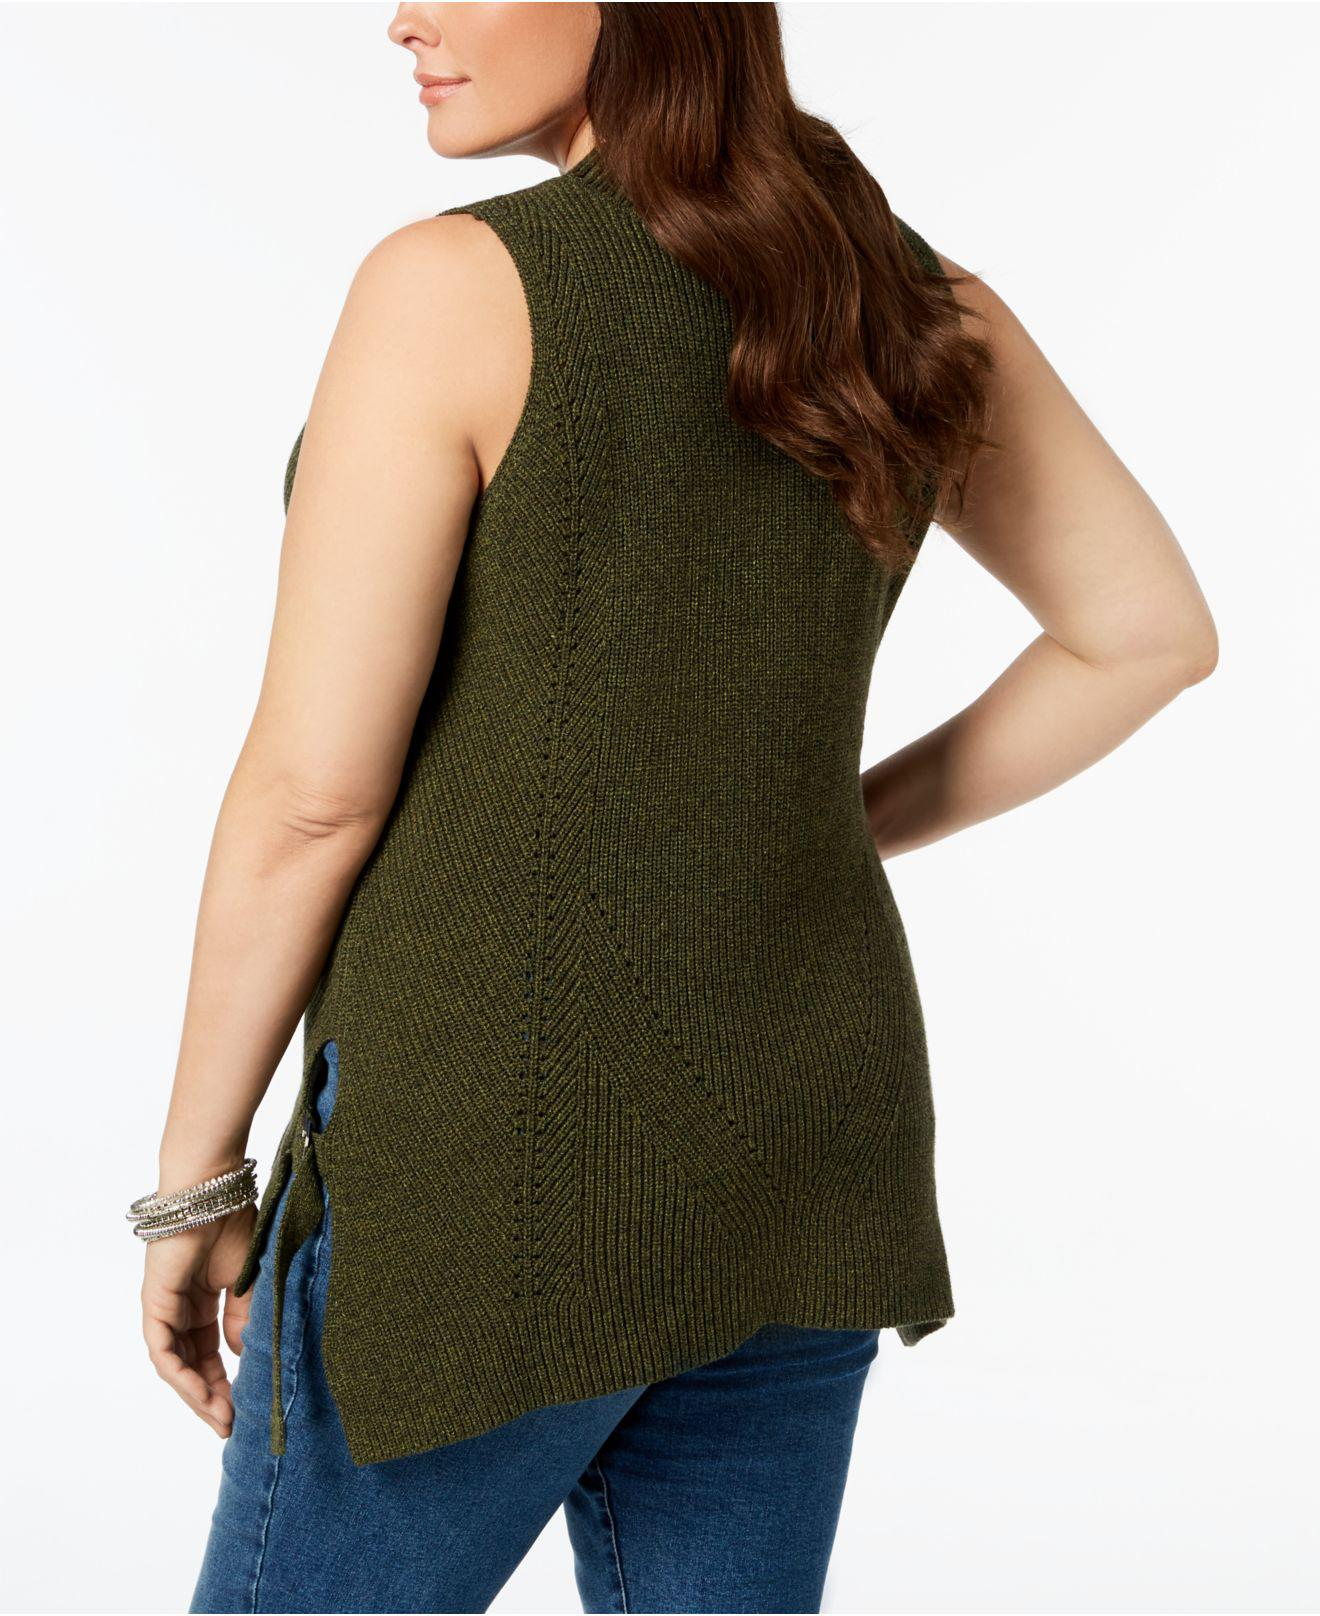 619ddb07c7a4f Lyst - 525 America Plus Size Sleeveless Tunic Sweater